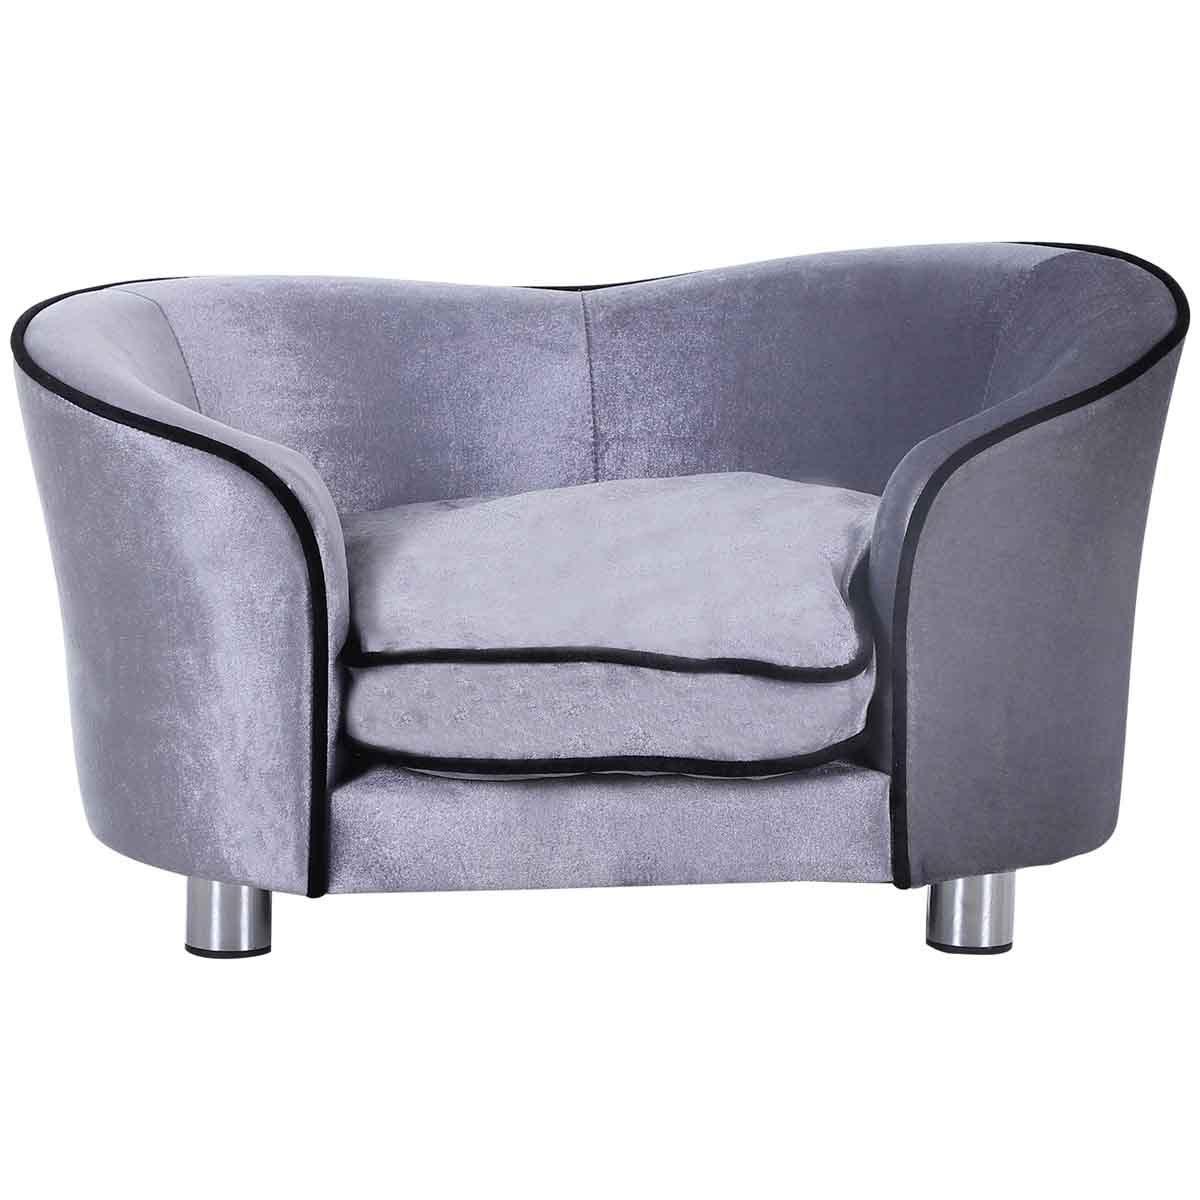 PawHut Elevated Pet Sofa Bed - Grey